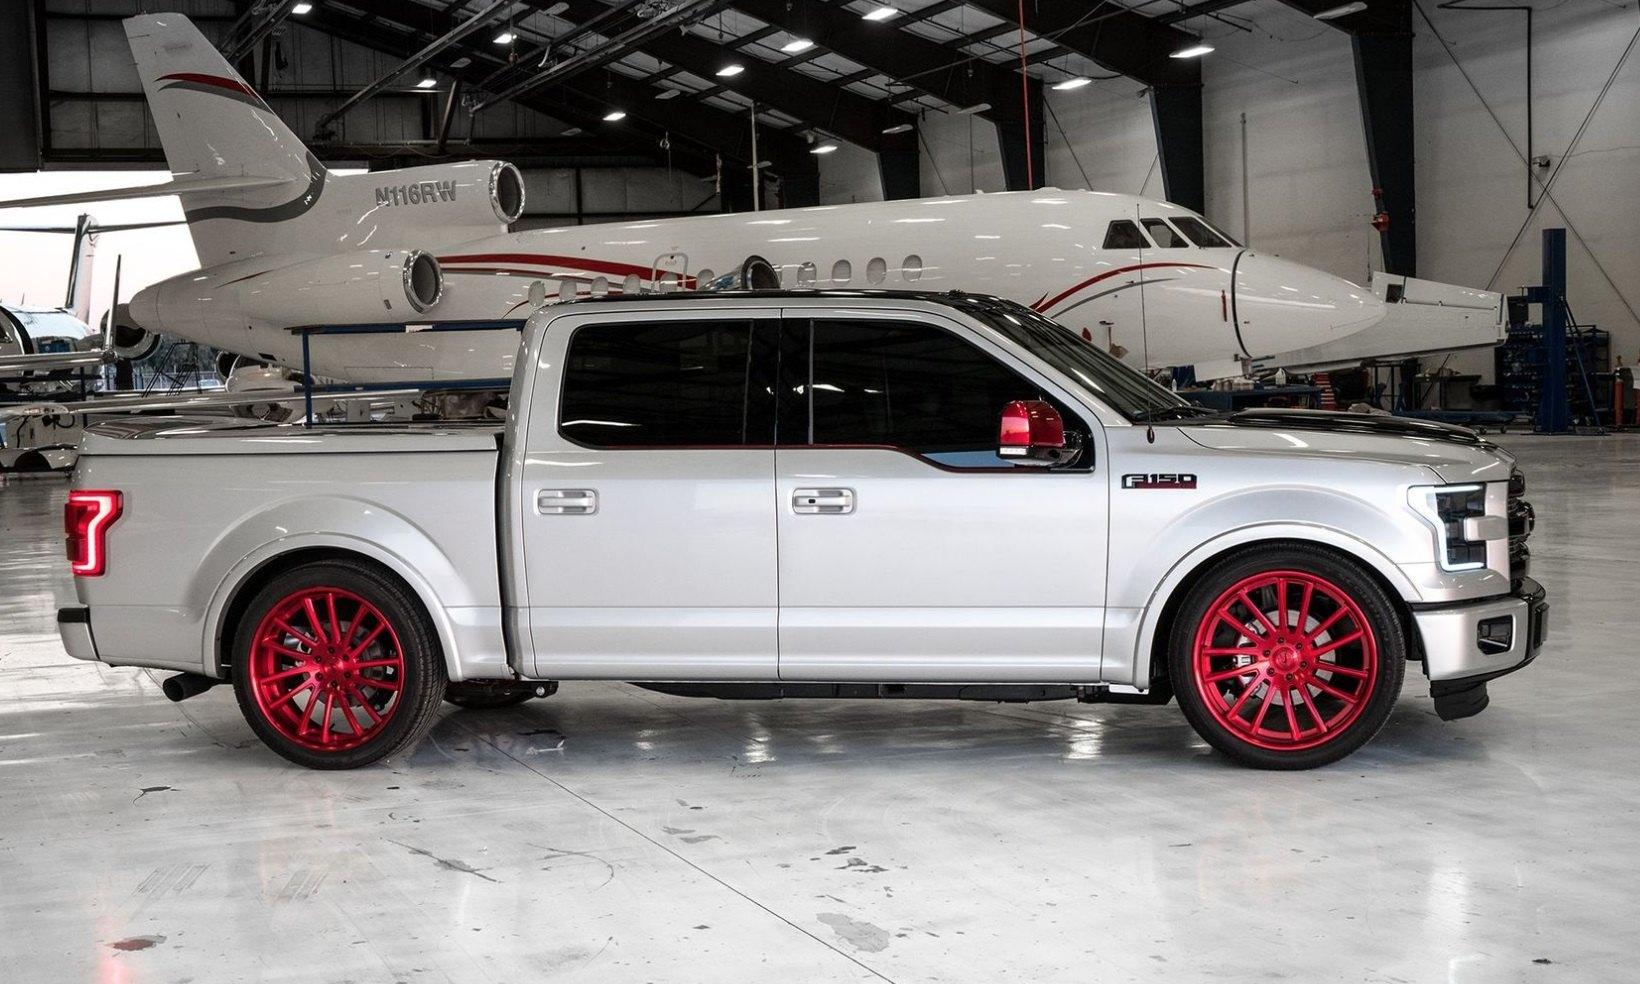 Lowered Black Top Ford F150 On Red Custom Wheels Carid Com Gallery